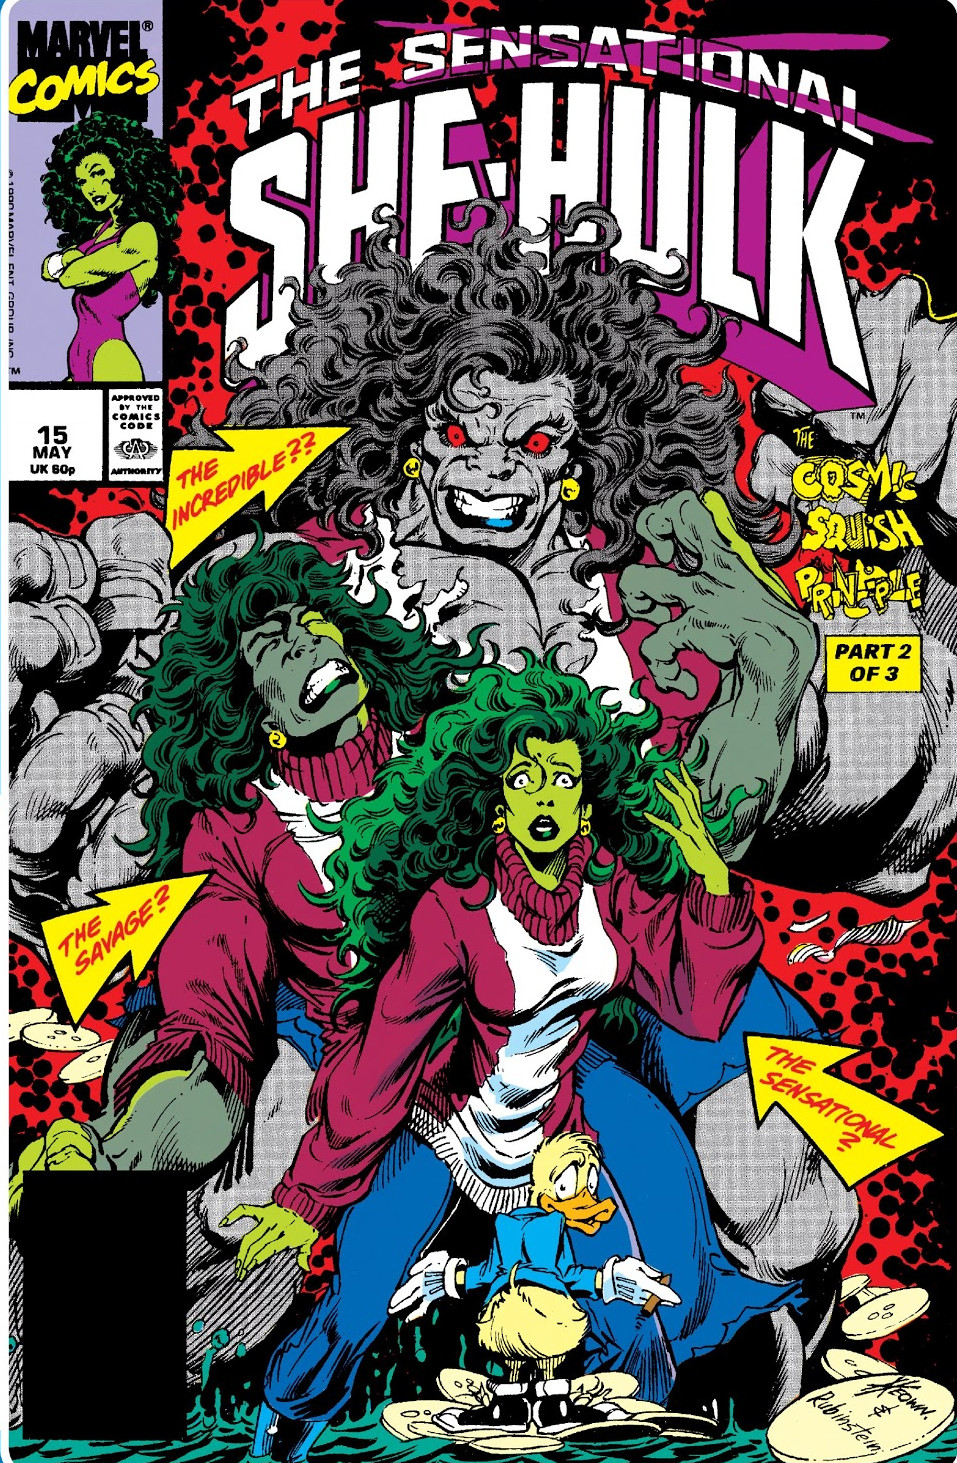 Sensational She-Hulk Vol 1 15 - Marvel Comics Database